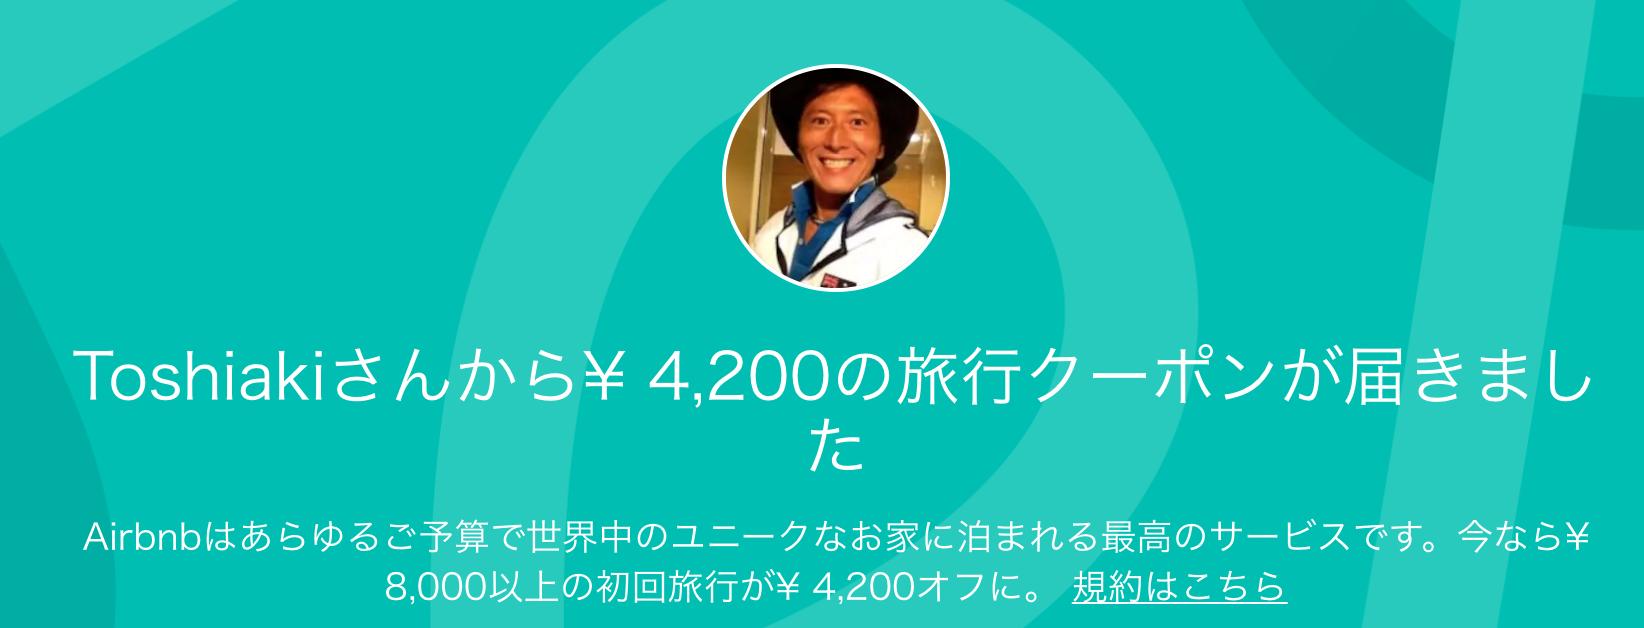 KNN招待コード&クーポンまとめサイト 2